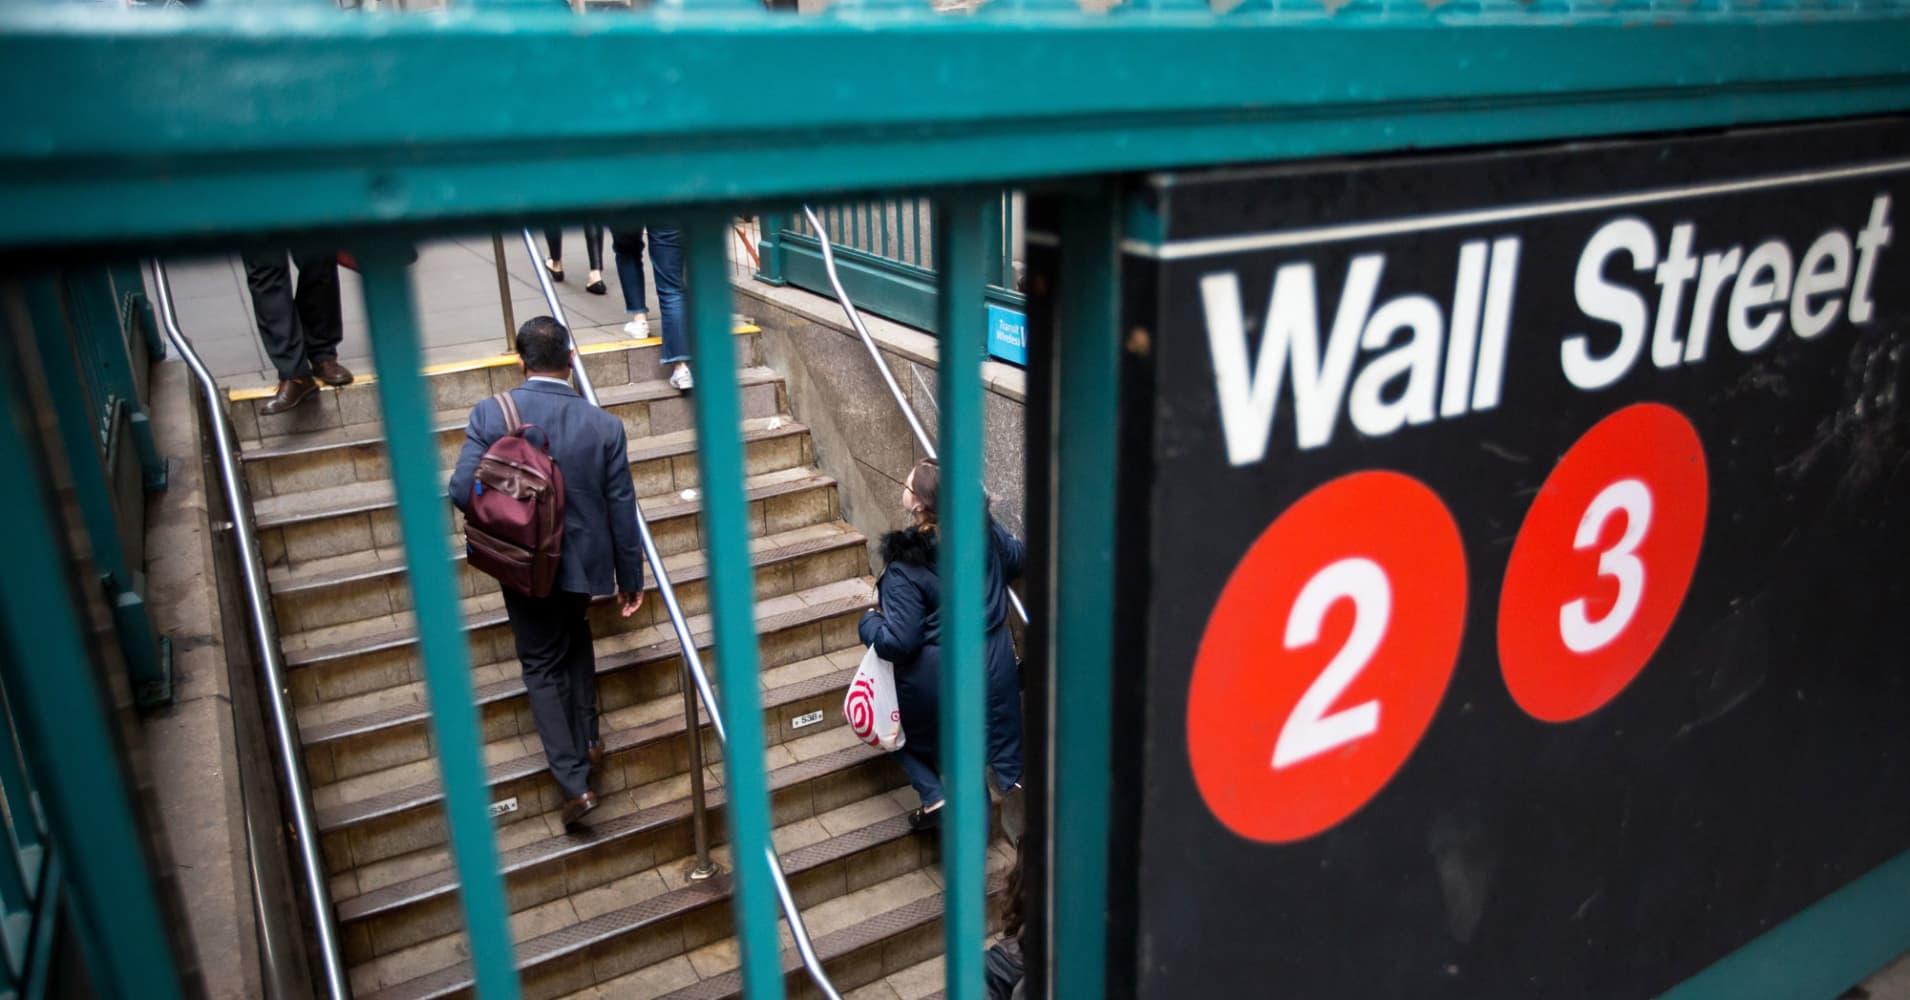 Wall Street bonuses reportedly being targeted again by bank regulators